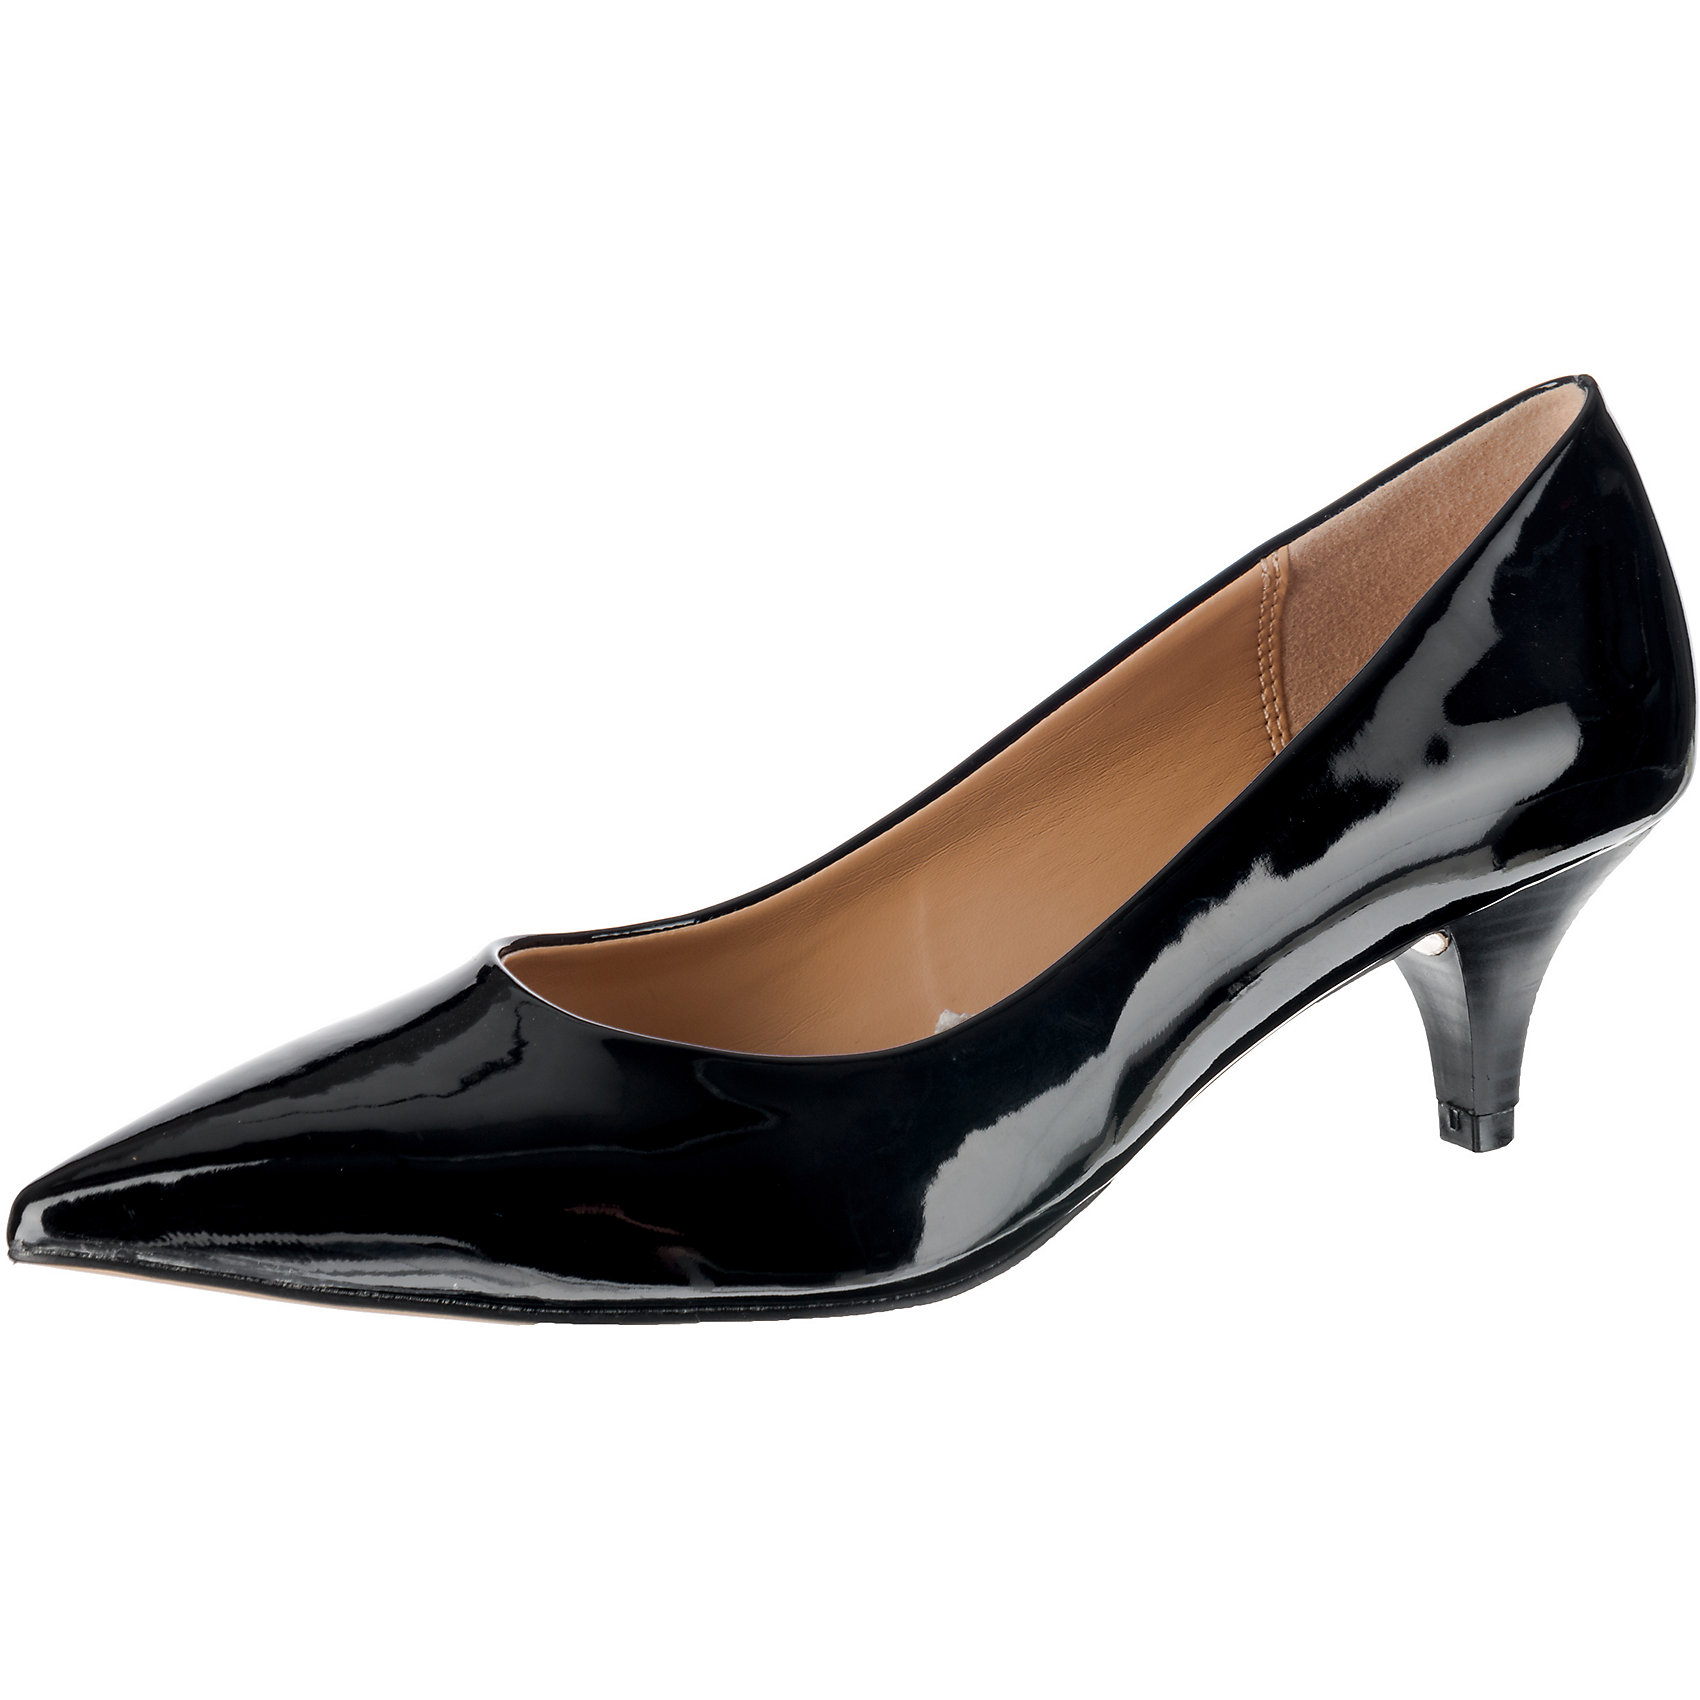 Esprit - Damen - Bijou pump - Pumps - schwarz pJgE9hkiw